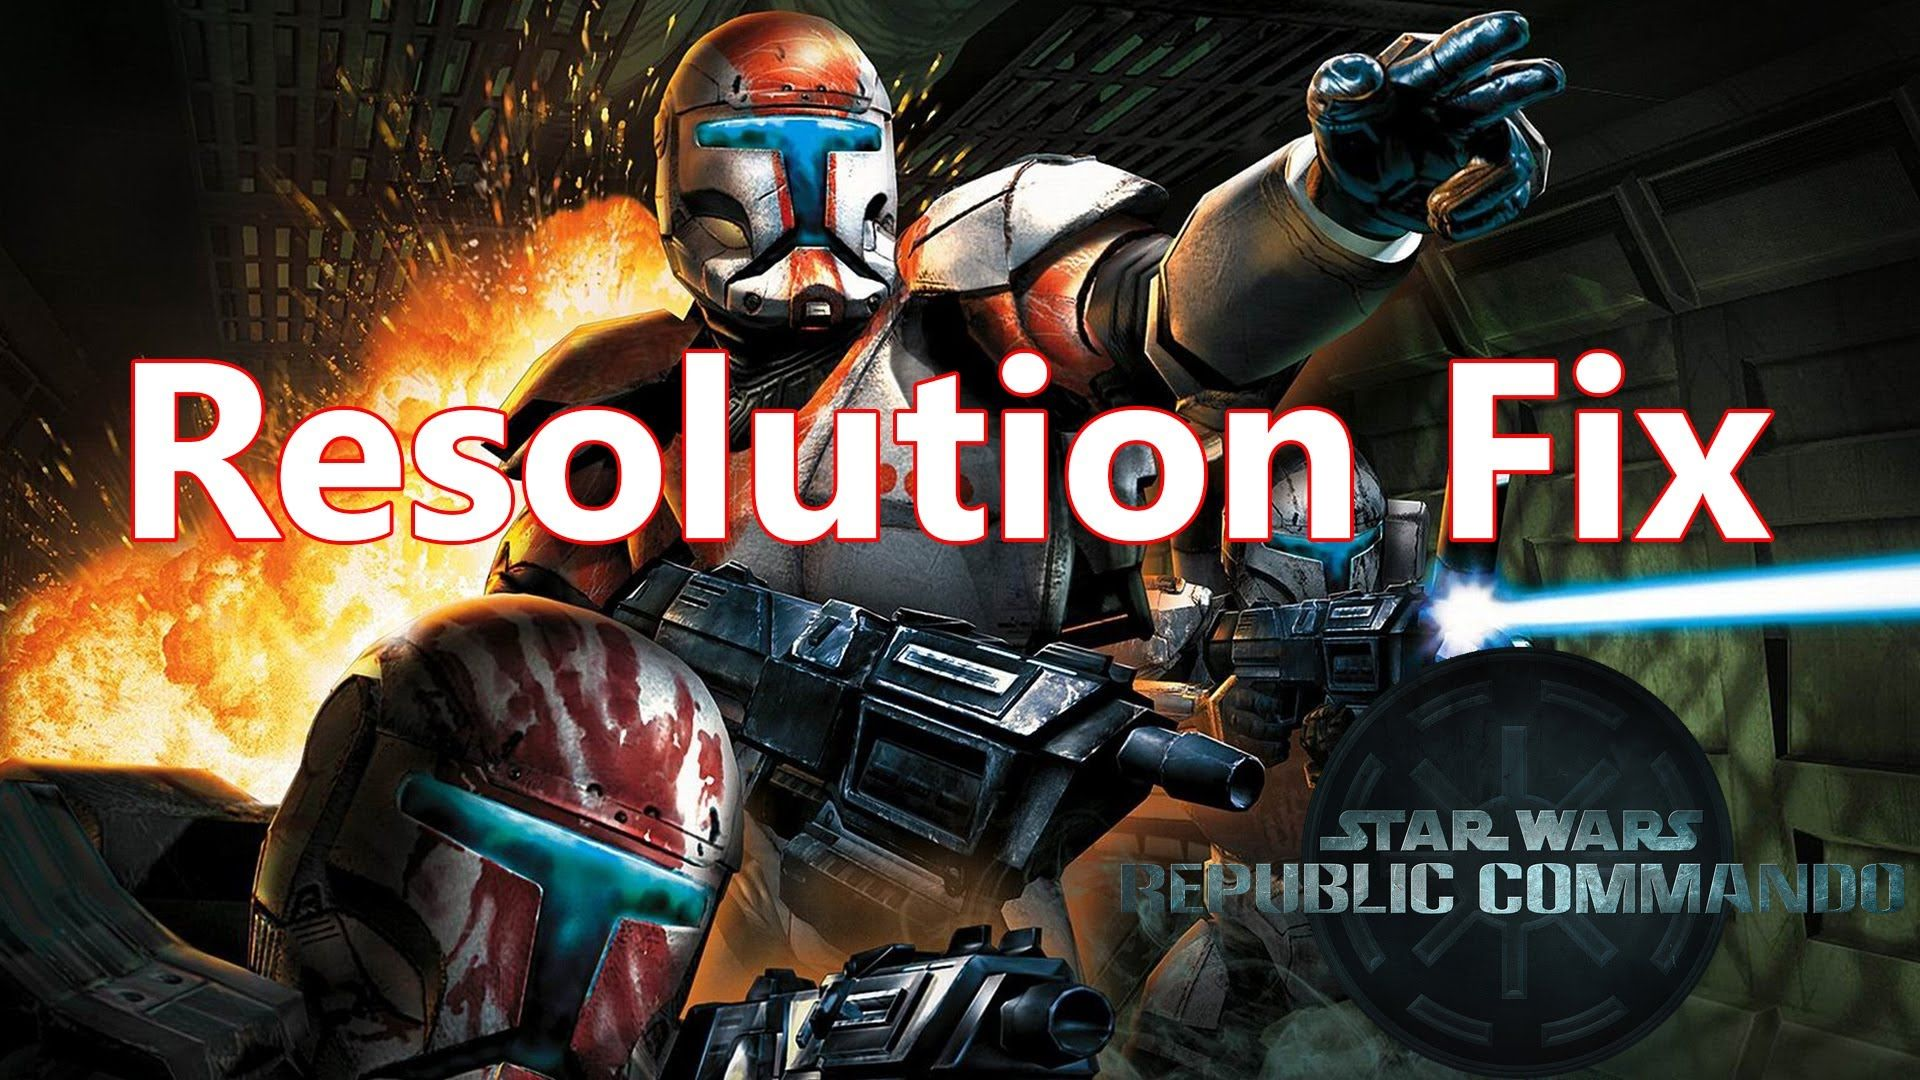 Free Download Cool Republic Commando Images